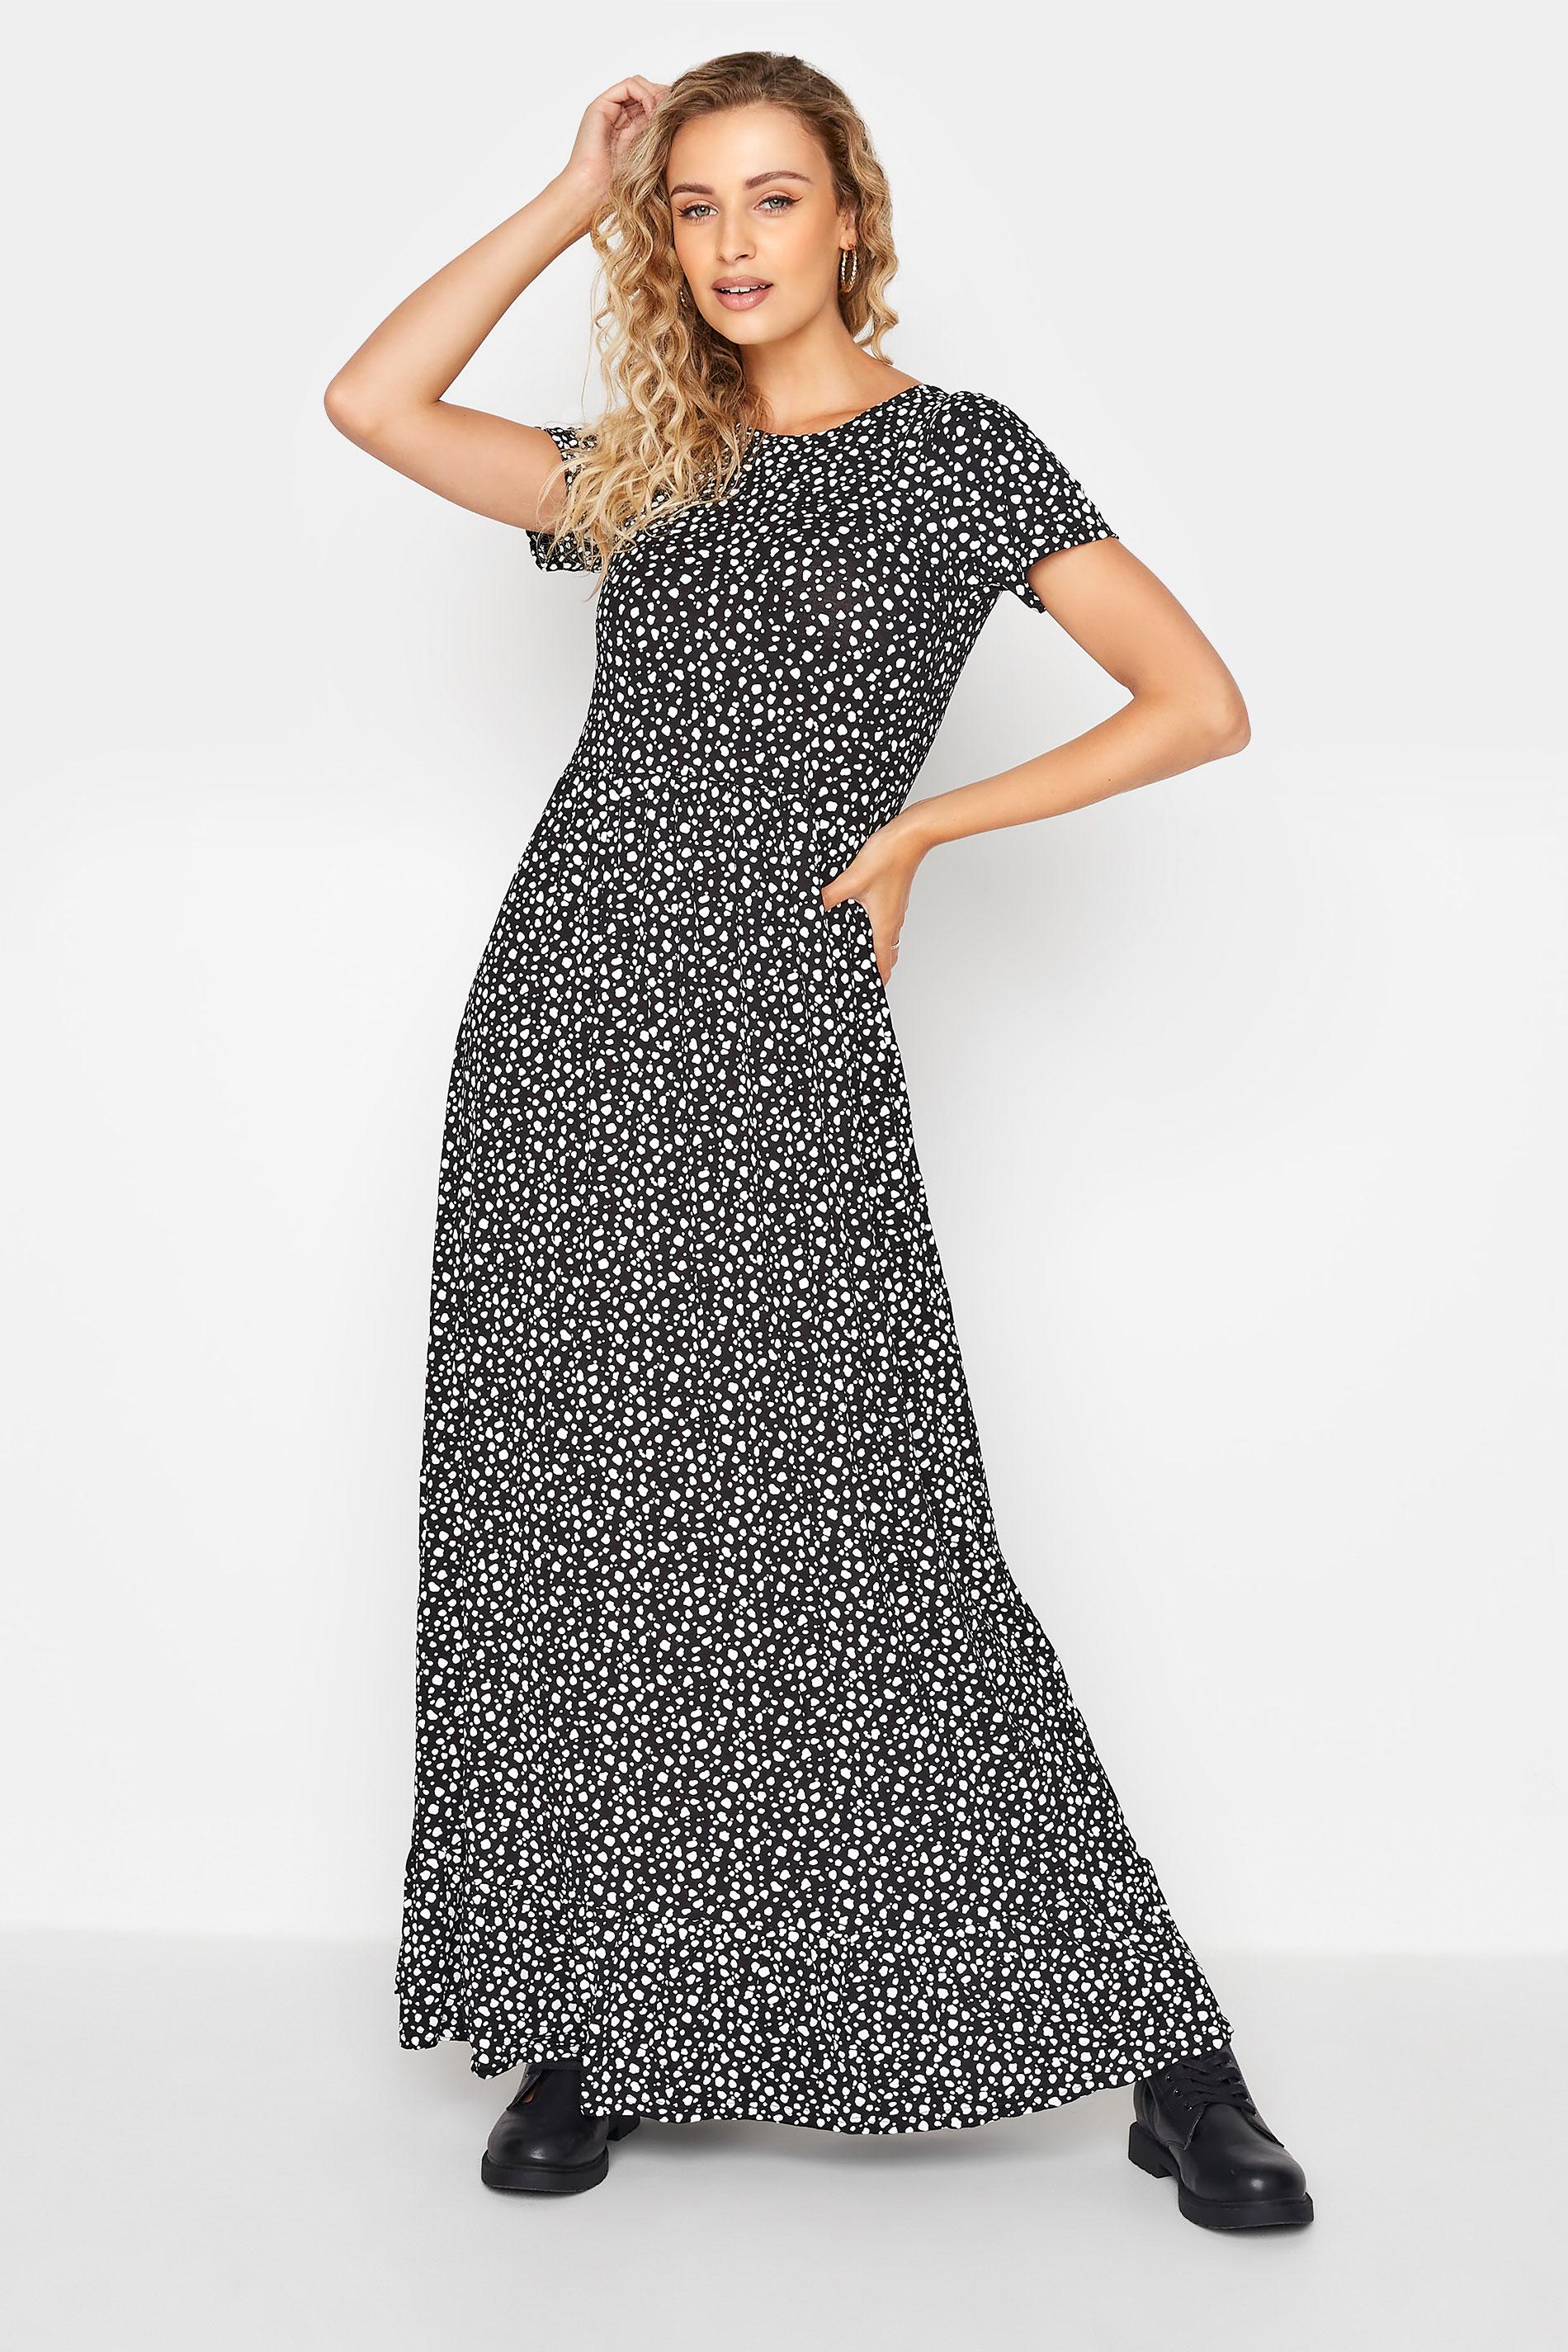 LTS Black Dalmatian Print Midaxi Dress